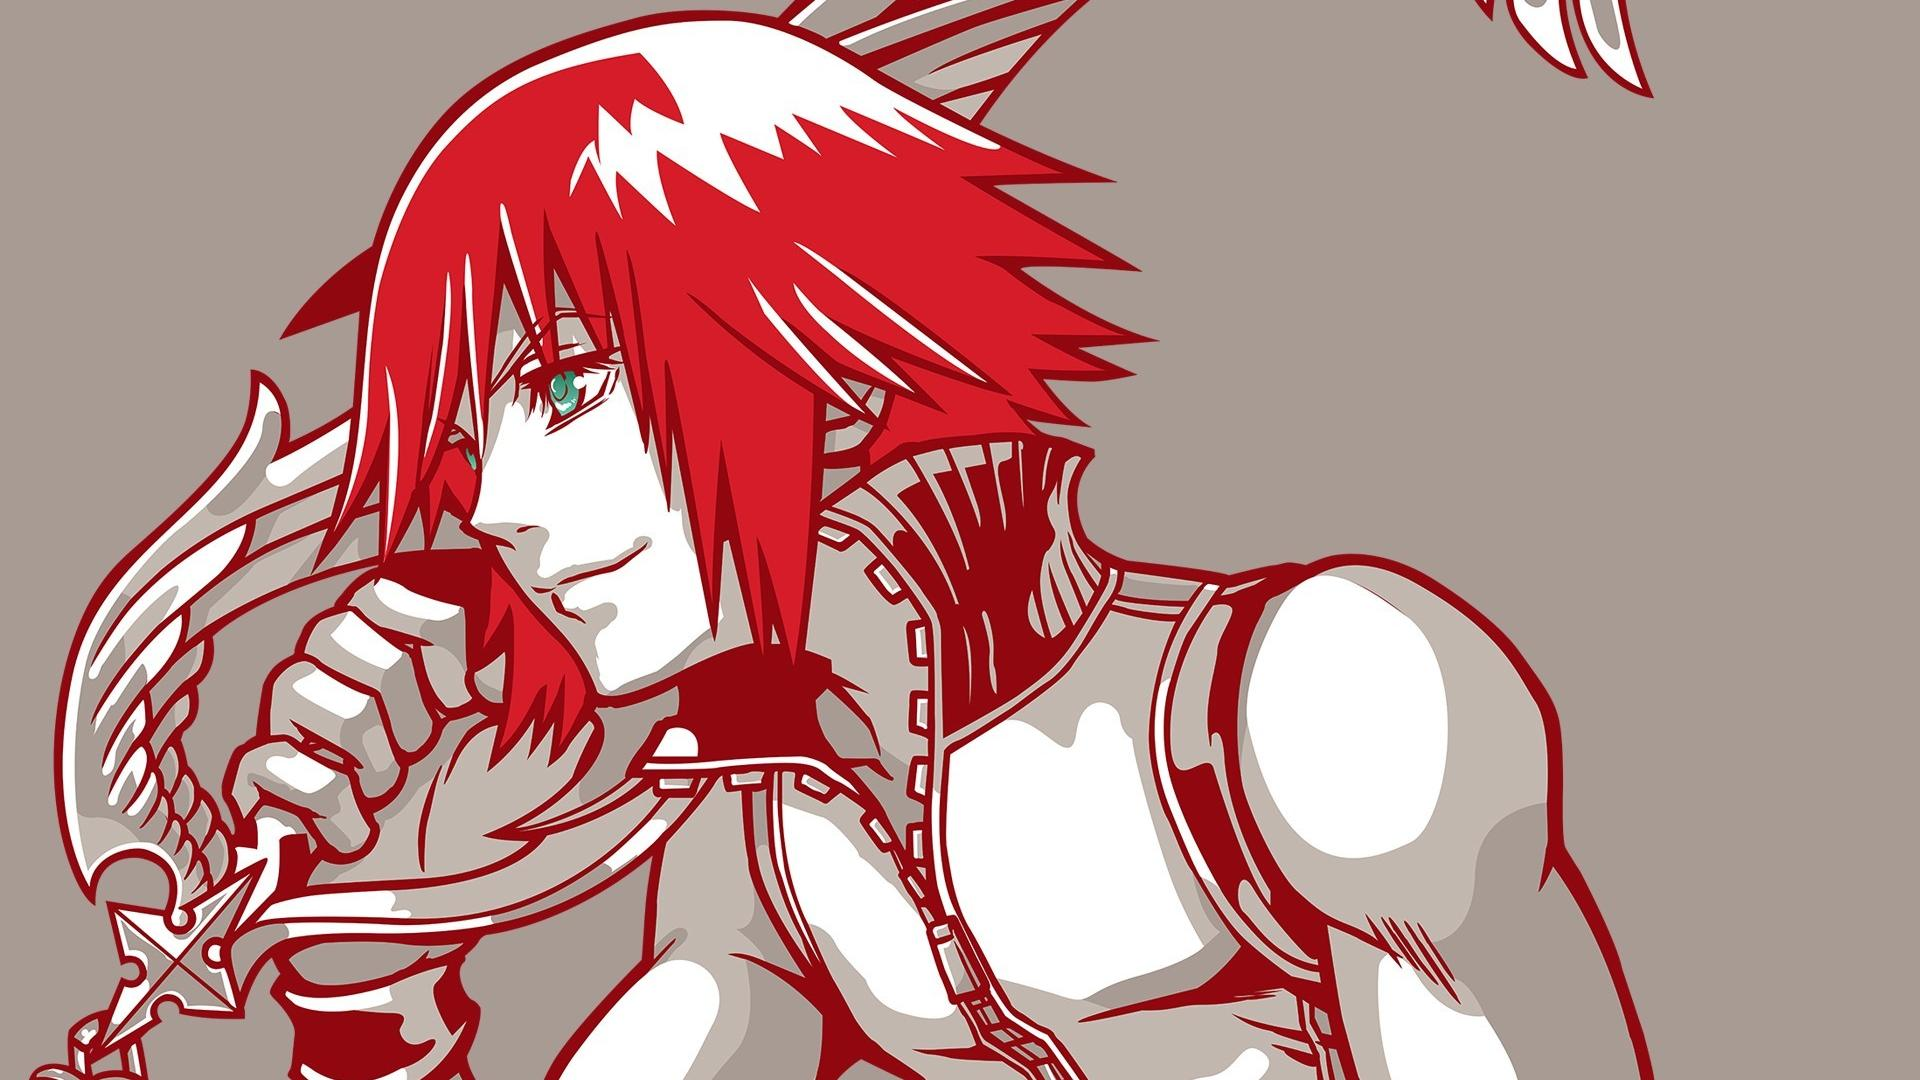 1920x1080 Kingdom Hearts Riku Vector Art Wallpaper (41619)